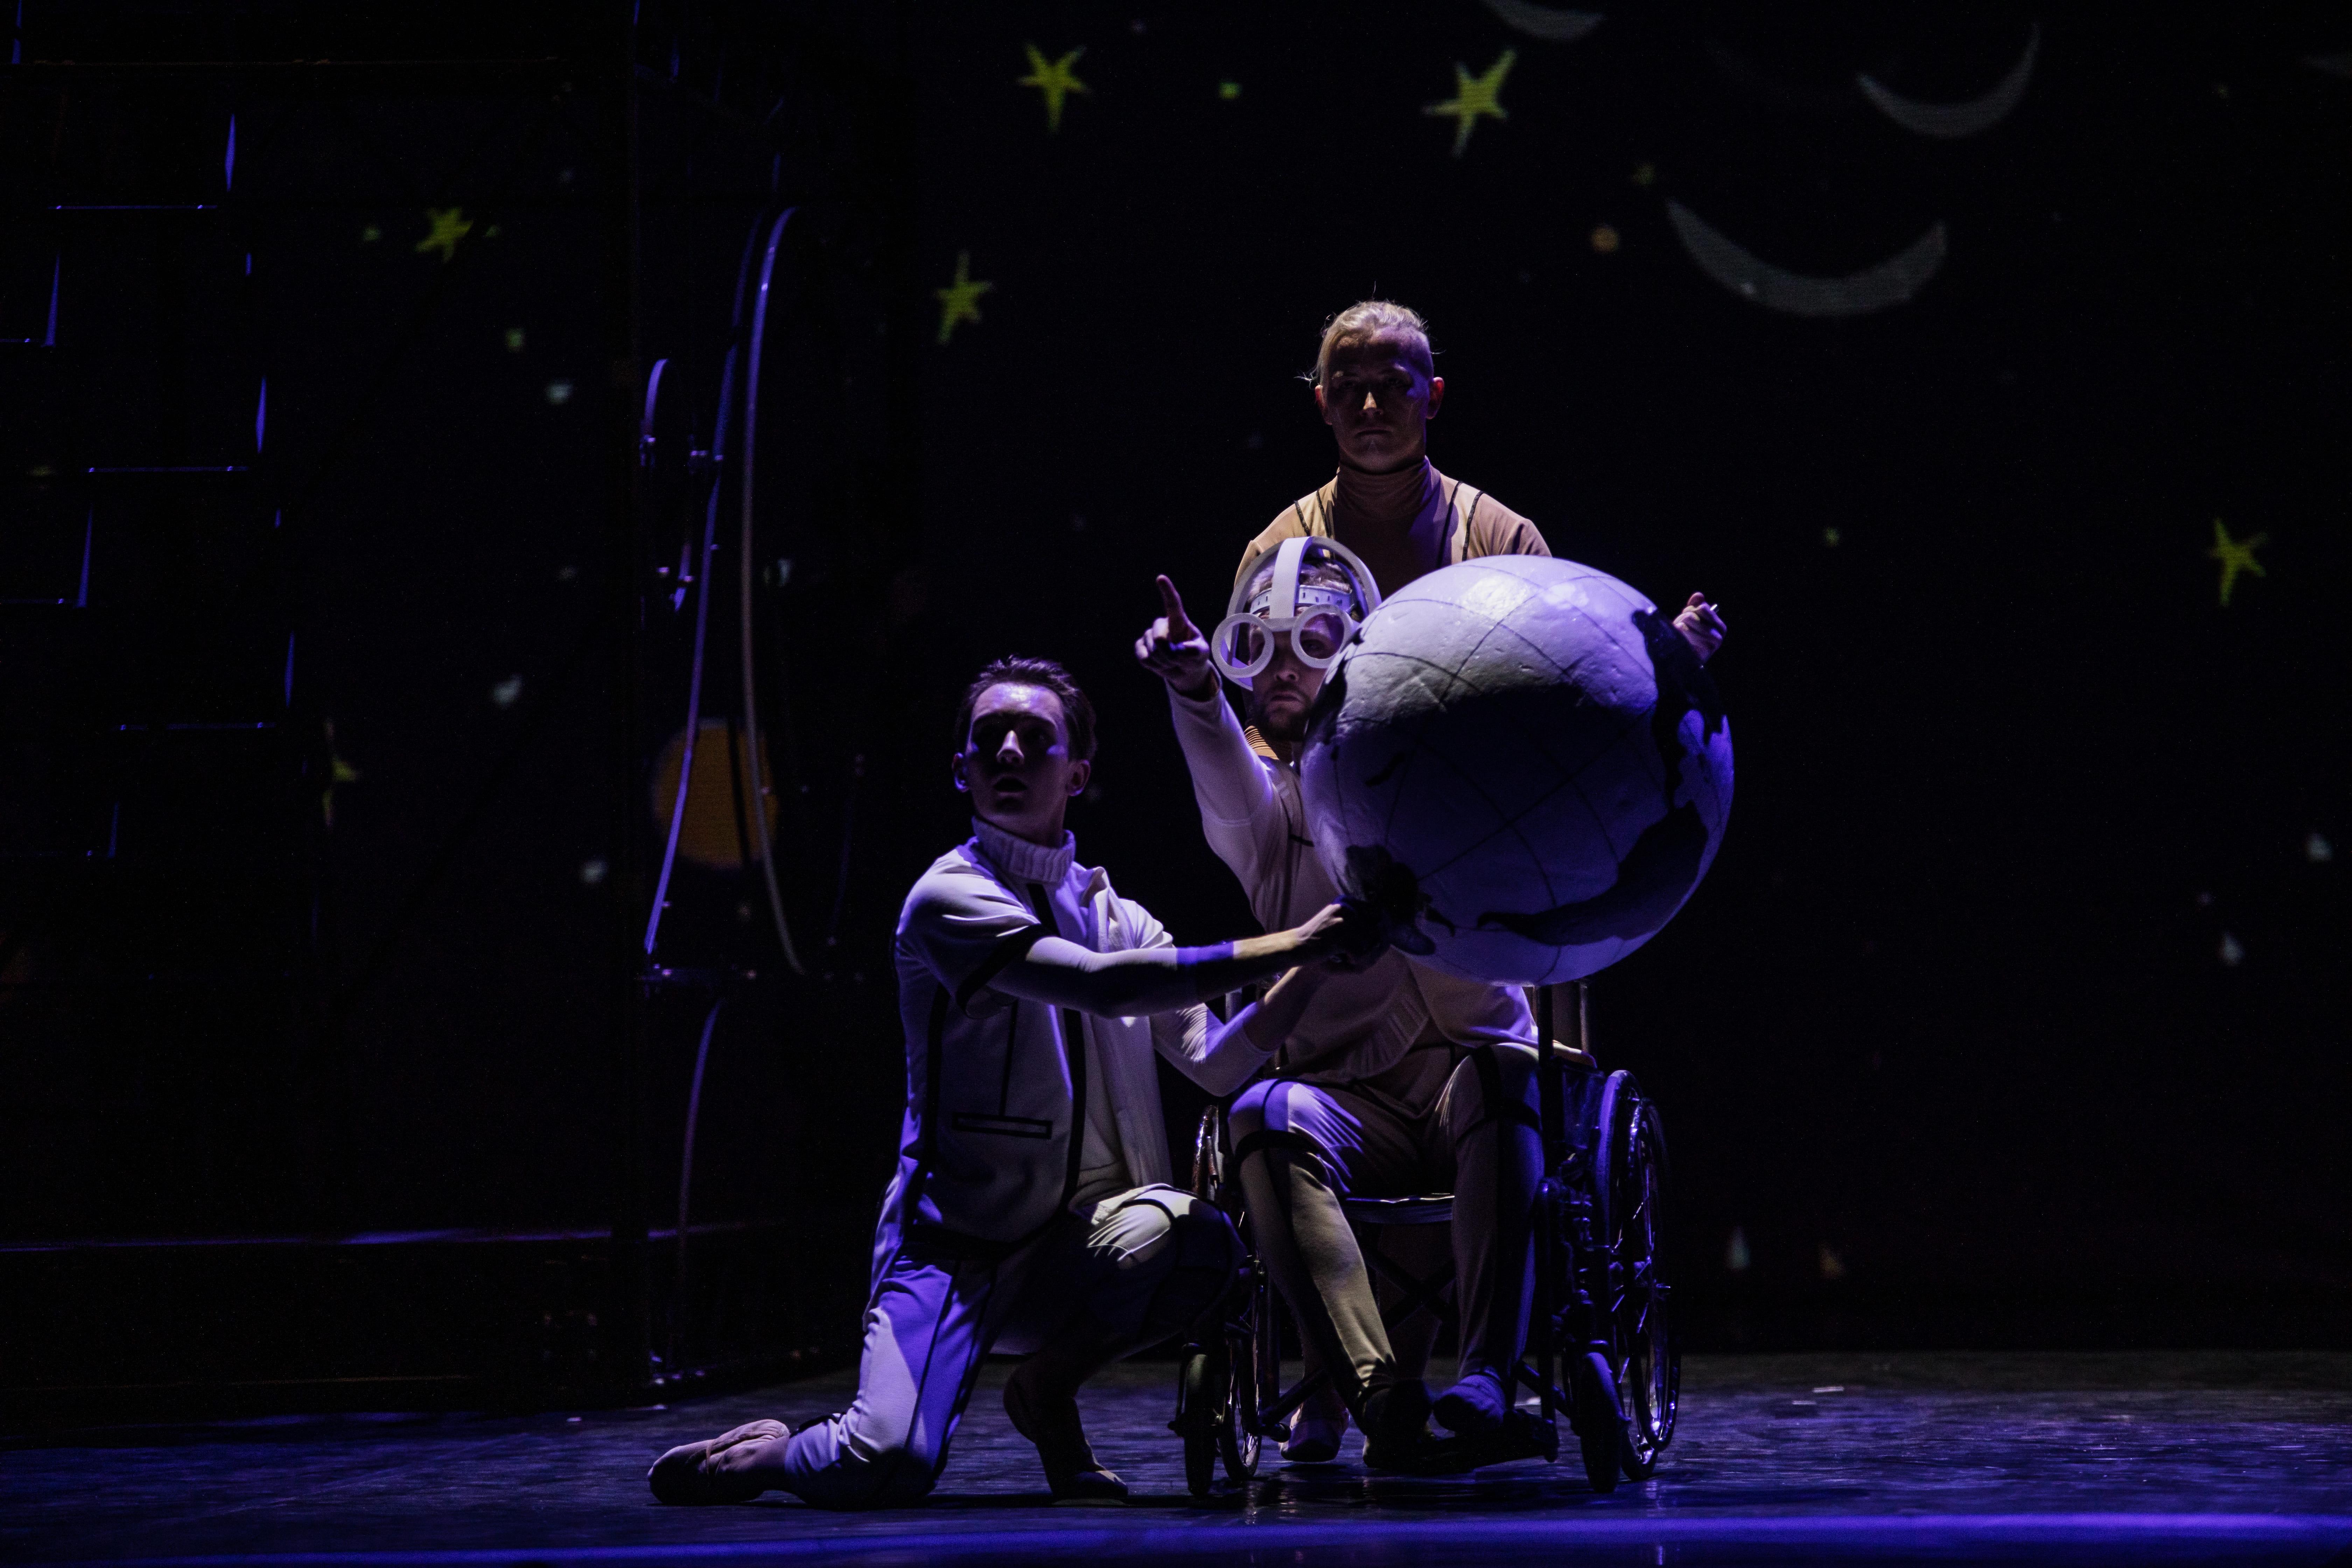 ТЕАТР Kyiv Modern Ballet. Маленький принц. Pаду Поклитару-2